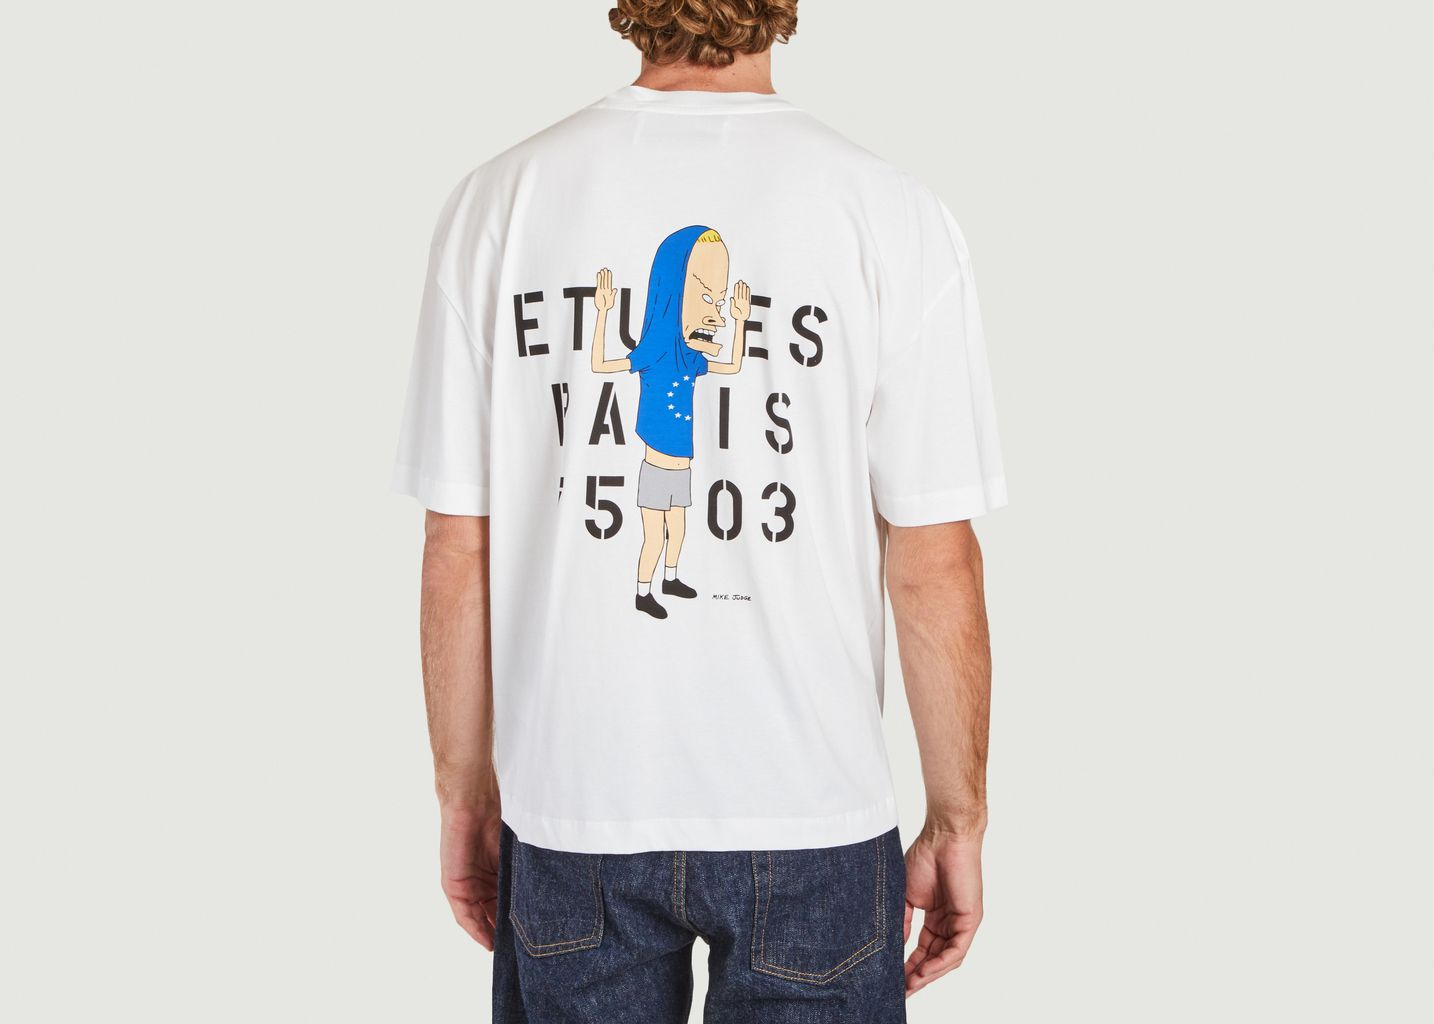 Etudes x Beavis & Butthead - Études